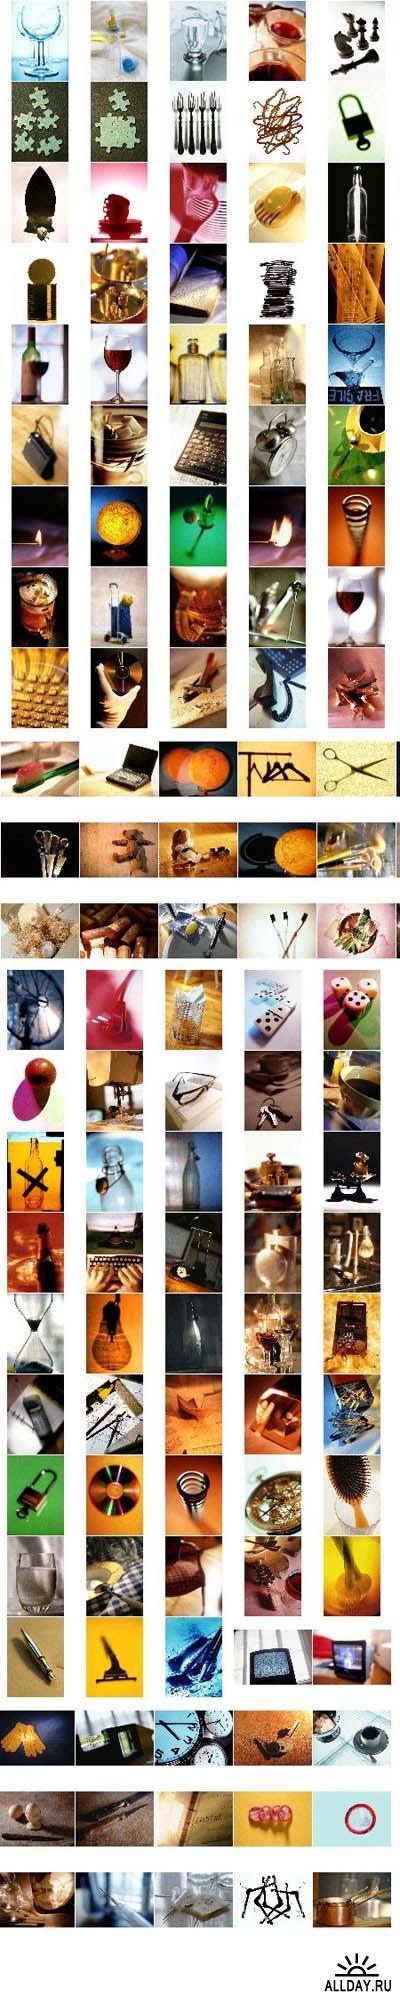 Objects | PhotoAlto | PA-027